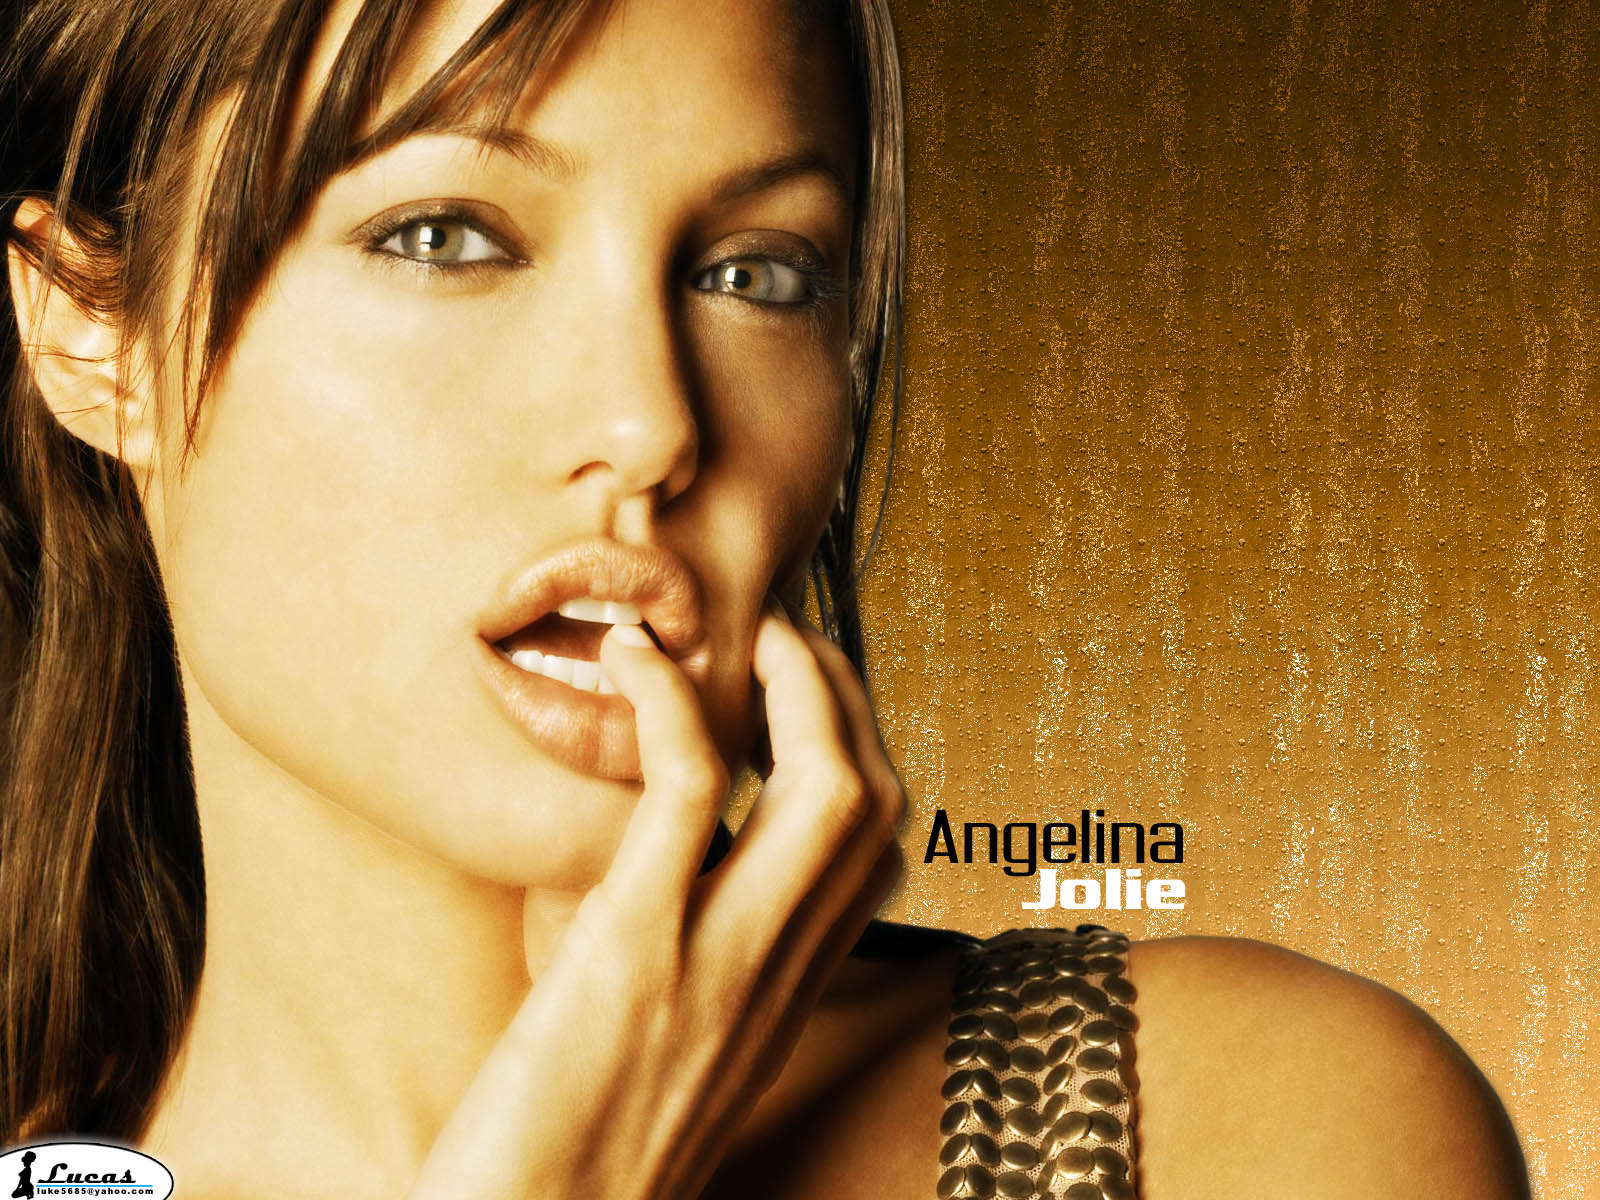 http://2.bp.blogspot.com/-qp4jMpitbzM/TwRl_oKvv3I/AAAAAAAAD-A/r5GXgxQuHsw/s1600/angelina-jolie-hot-sexy.jpg